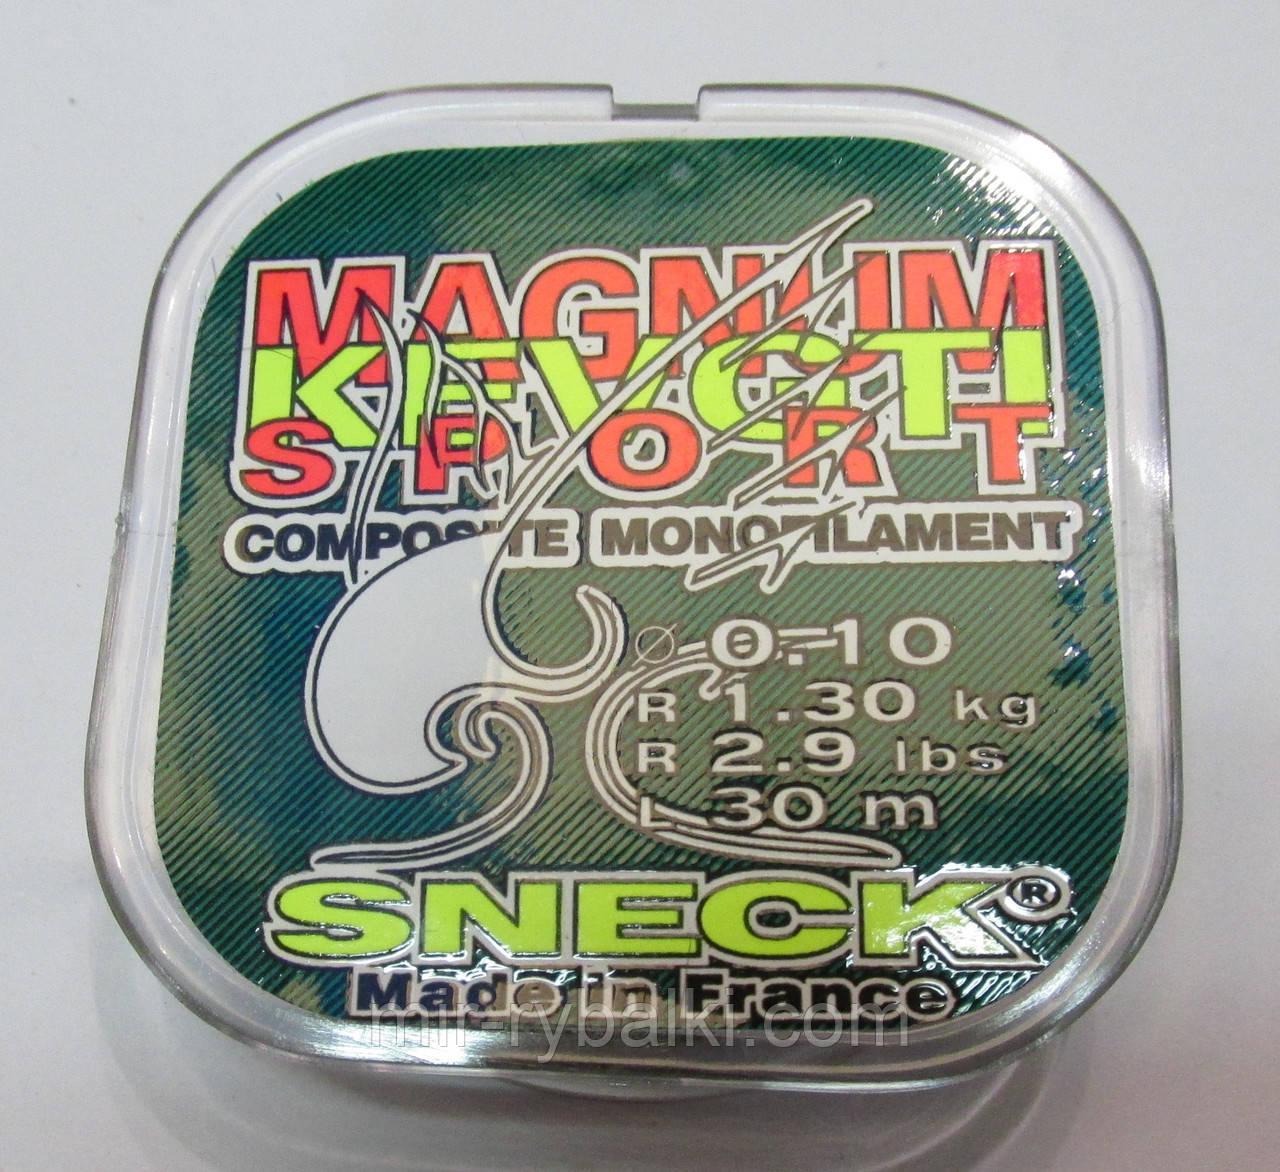 Леска Sneck Magnum Kevgti Sport 0.10mm 30m